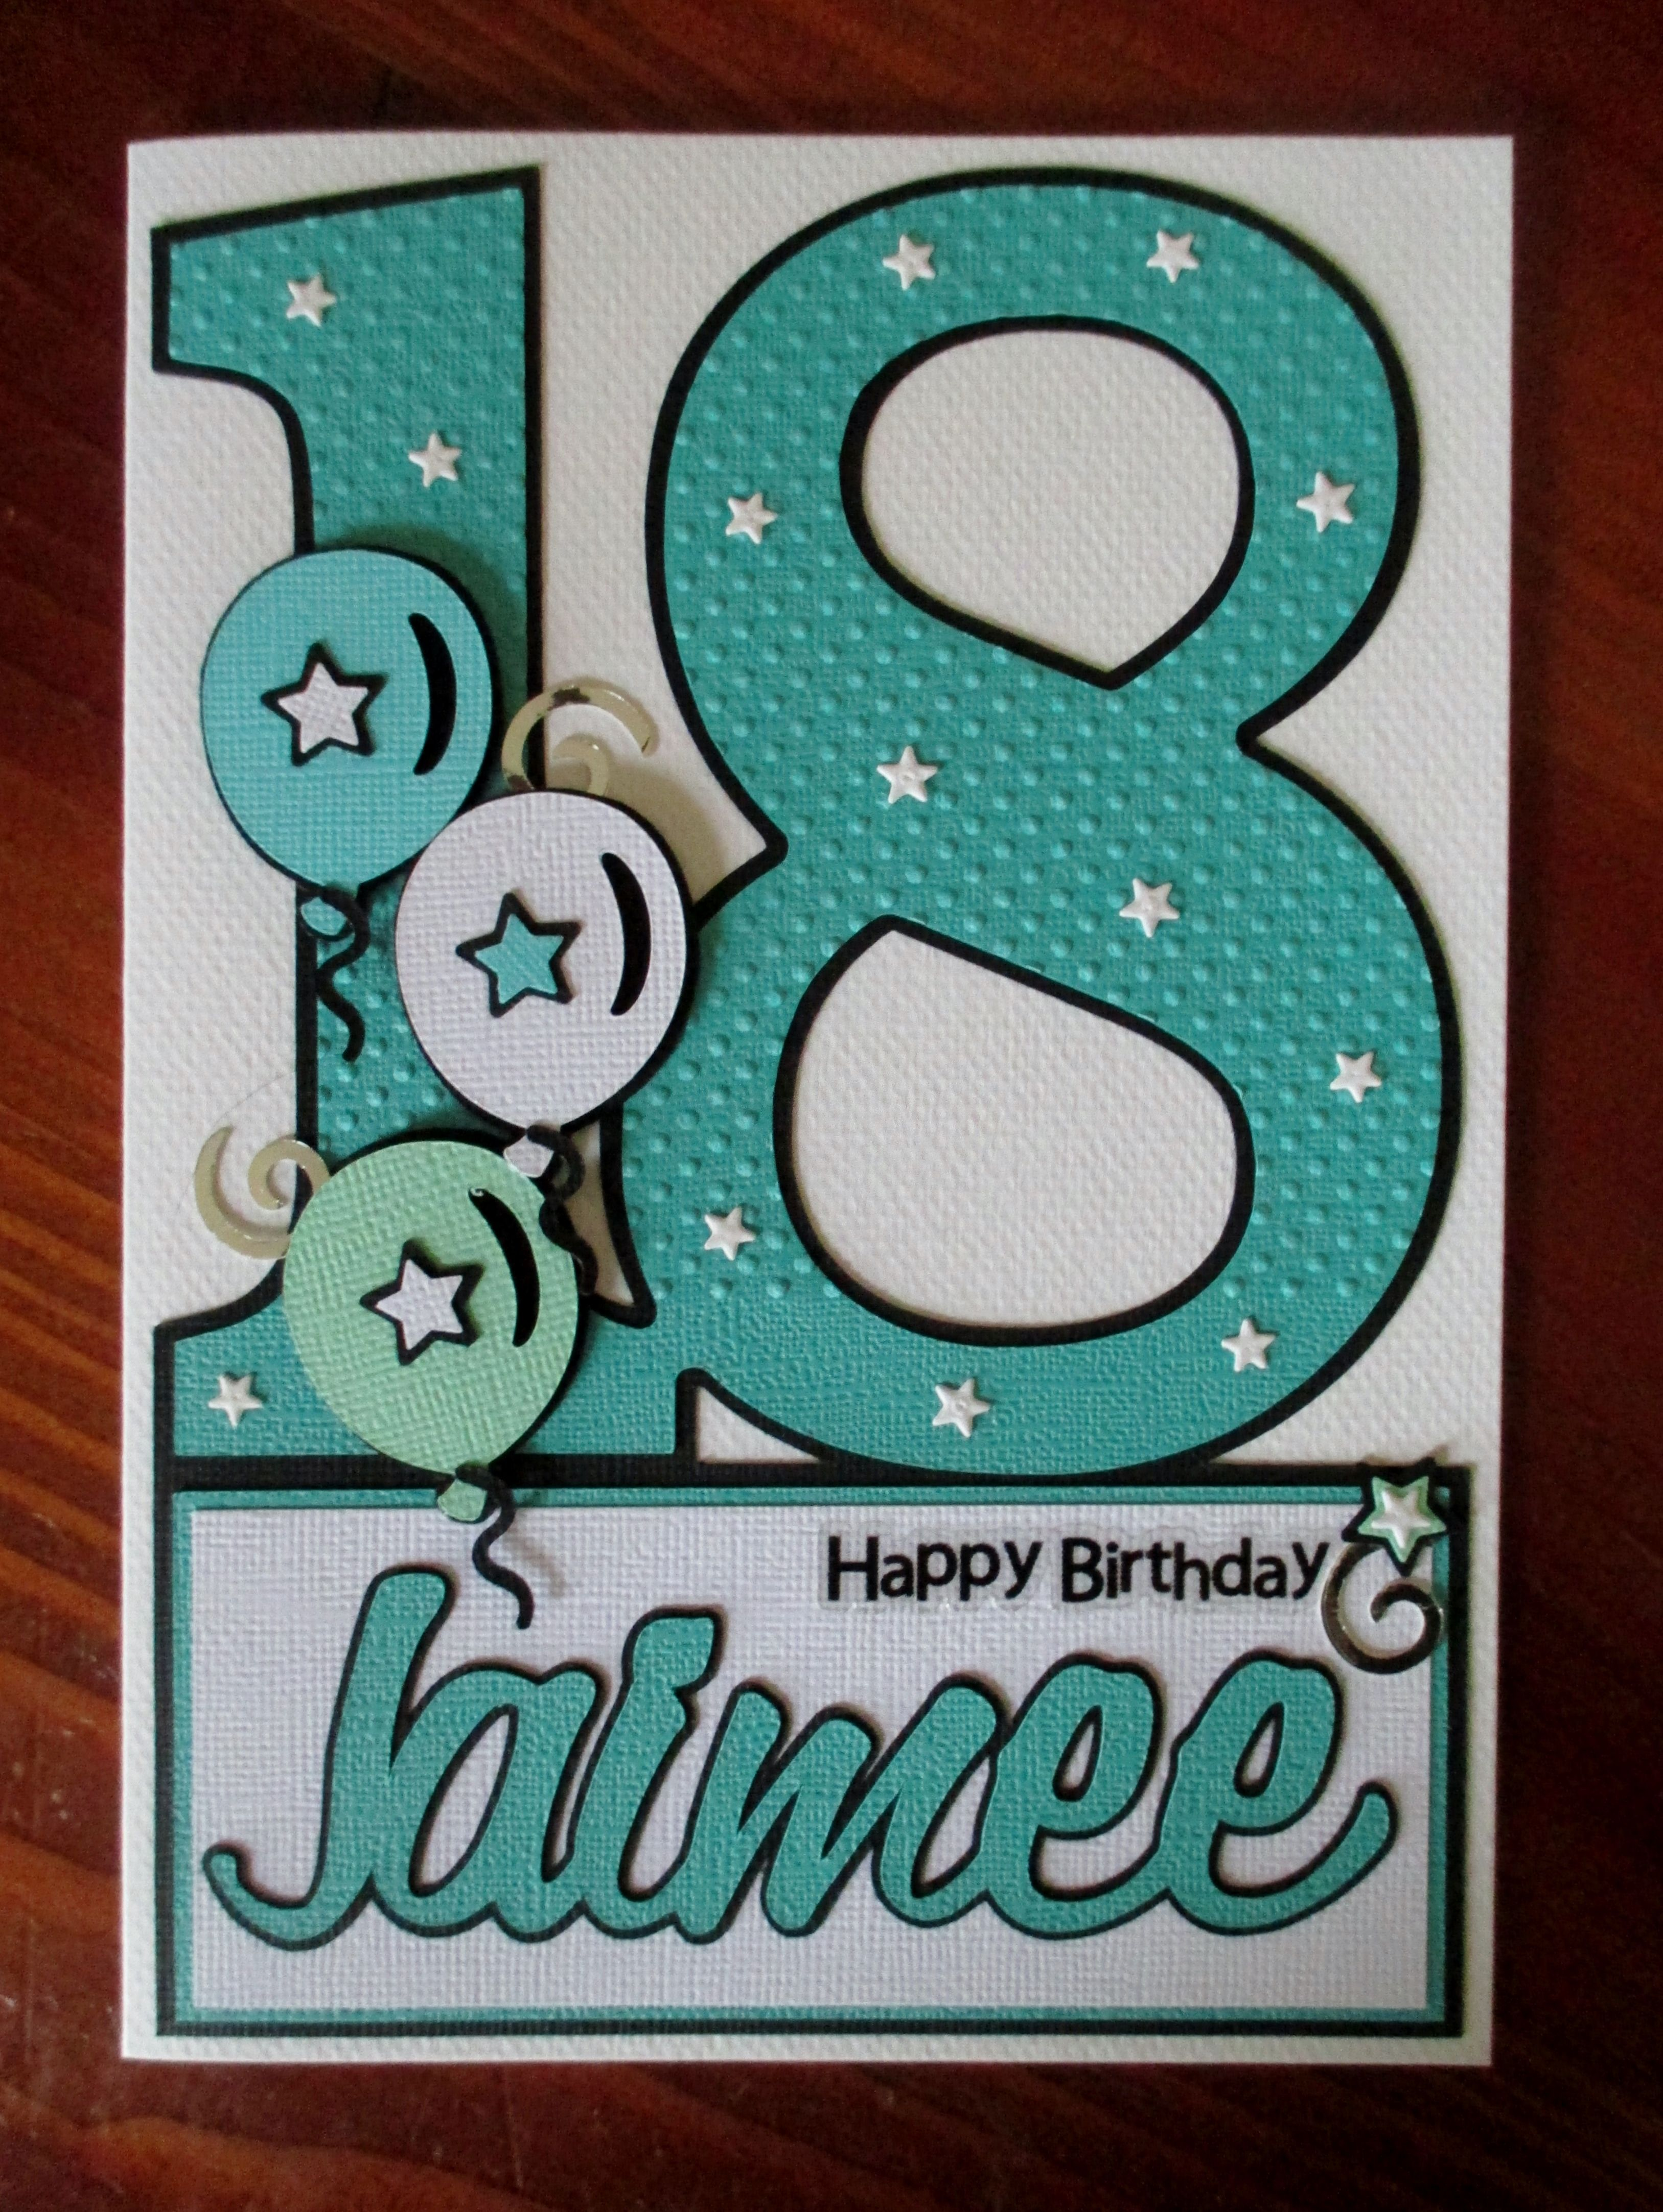 An 18th birthday card for Jaimee! More